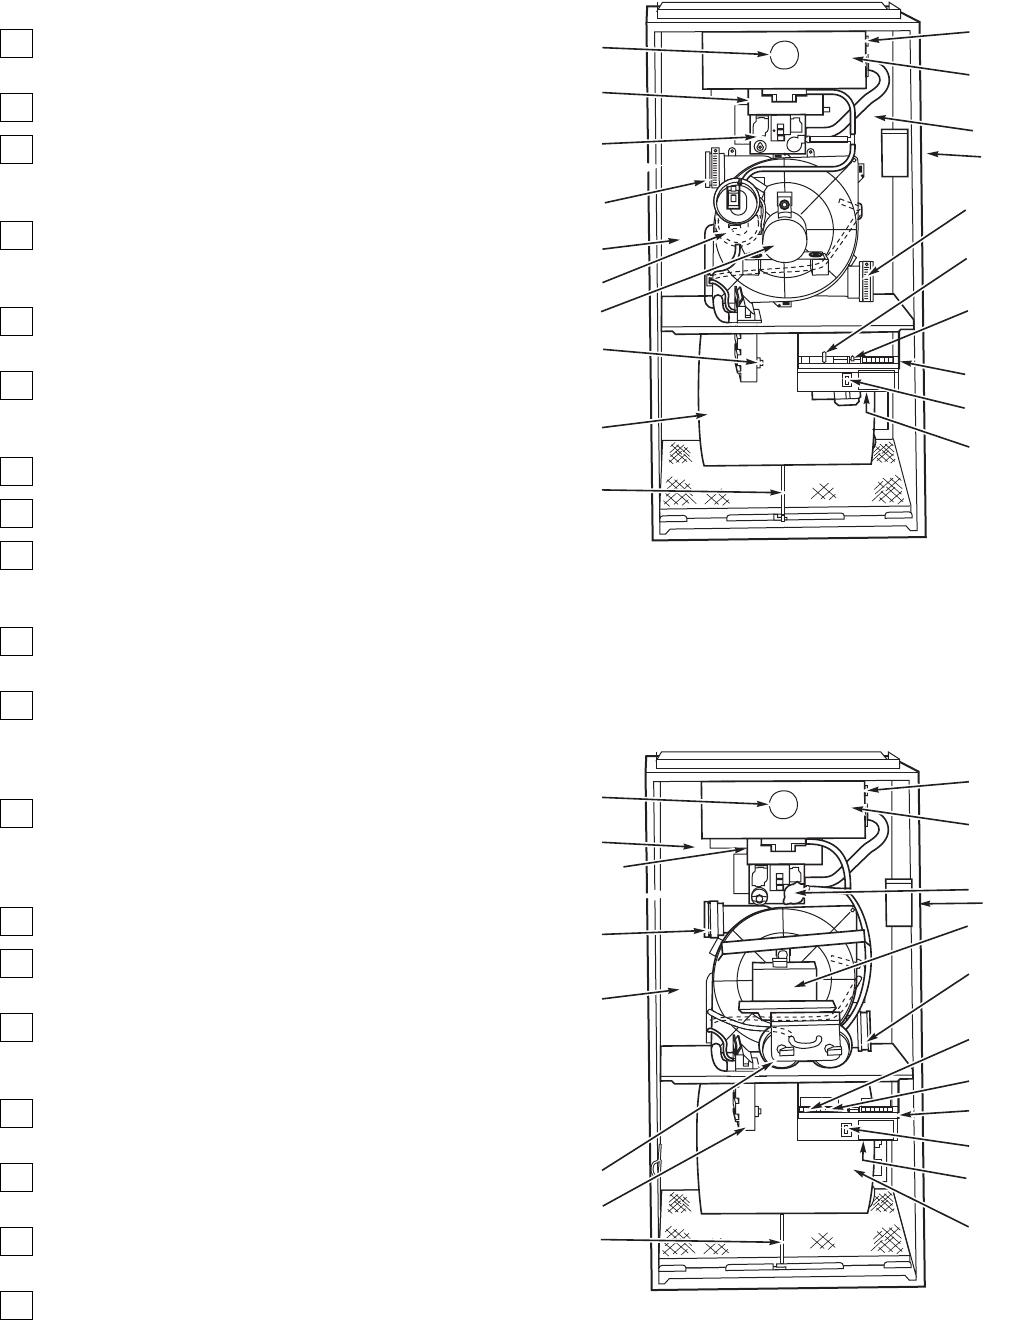 Bryant 350MAV, 352MAV, 355MAV FURNACE COMPONENTS, , MODELS